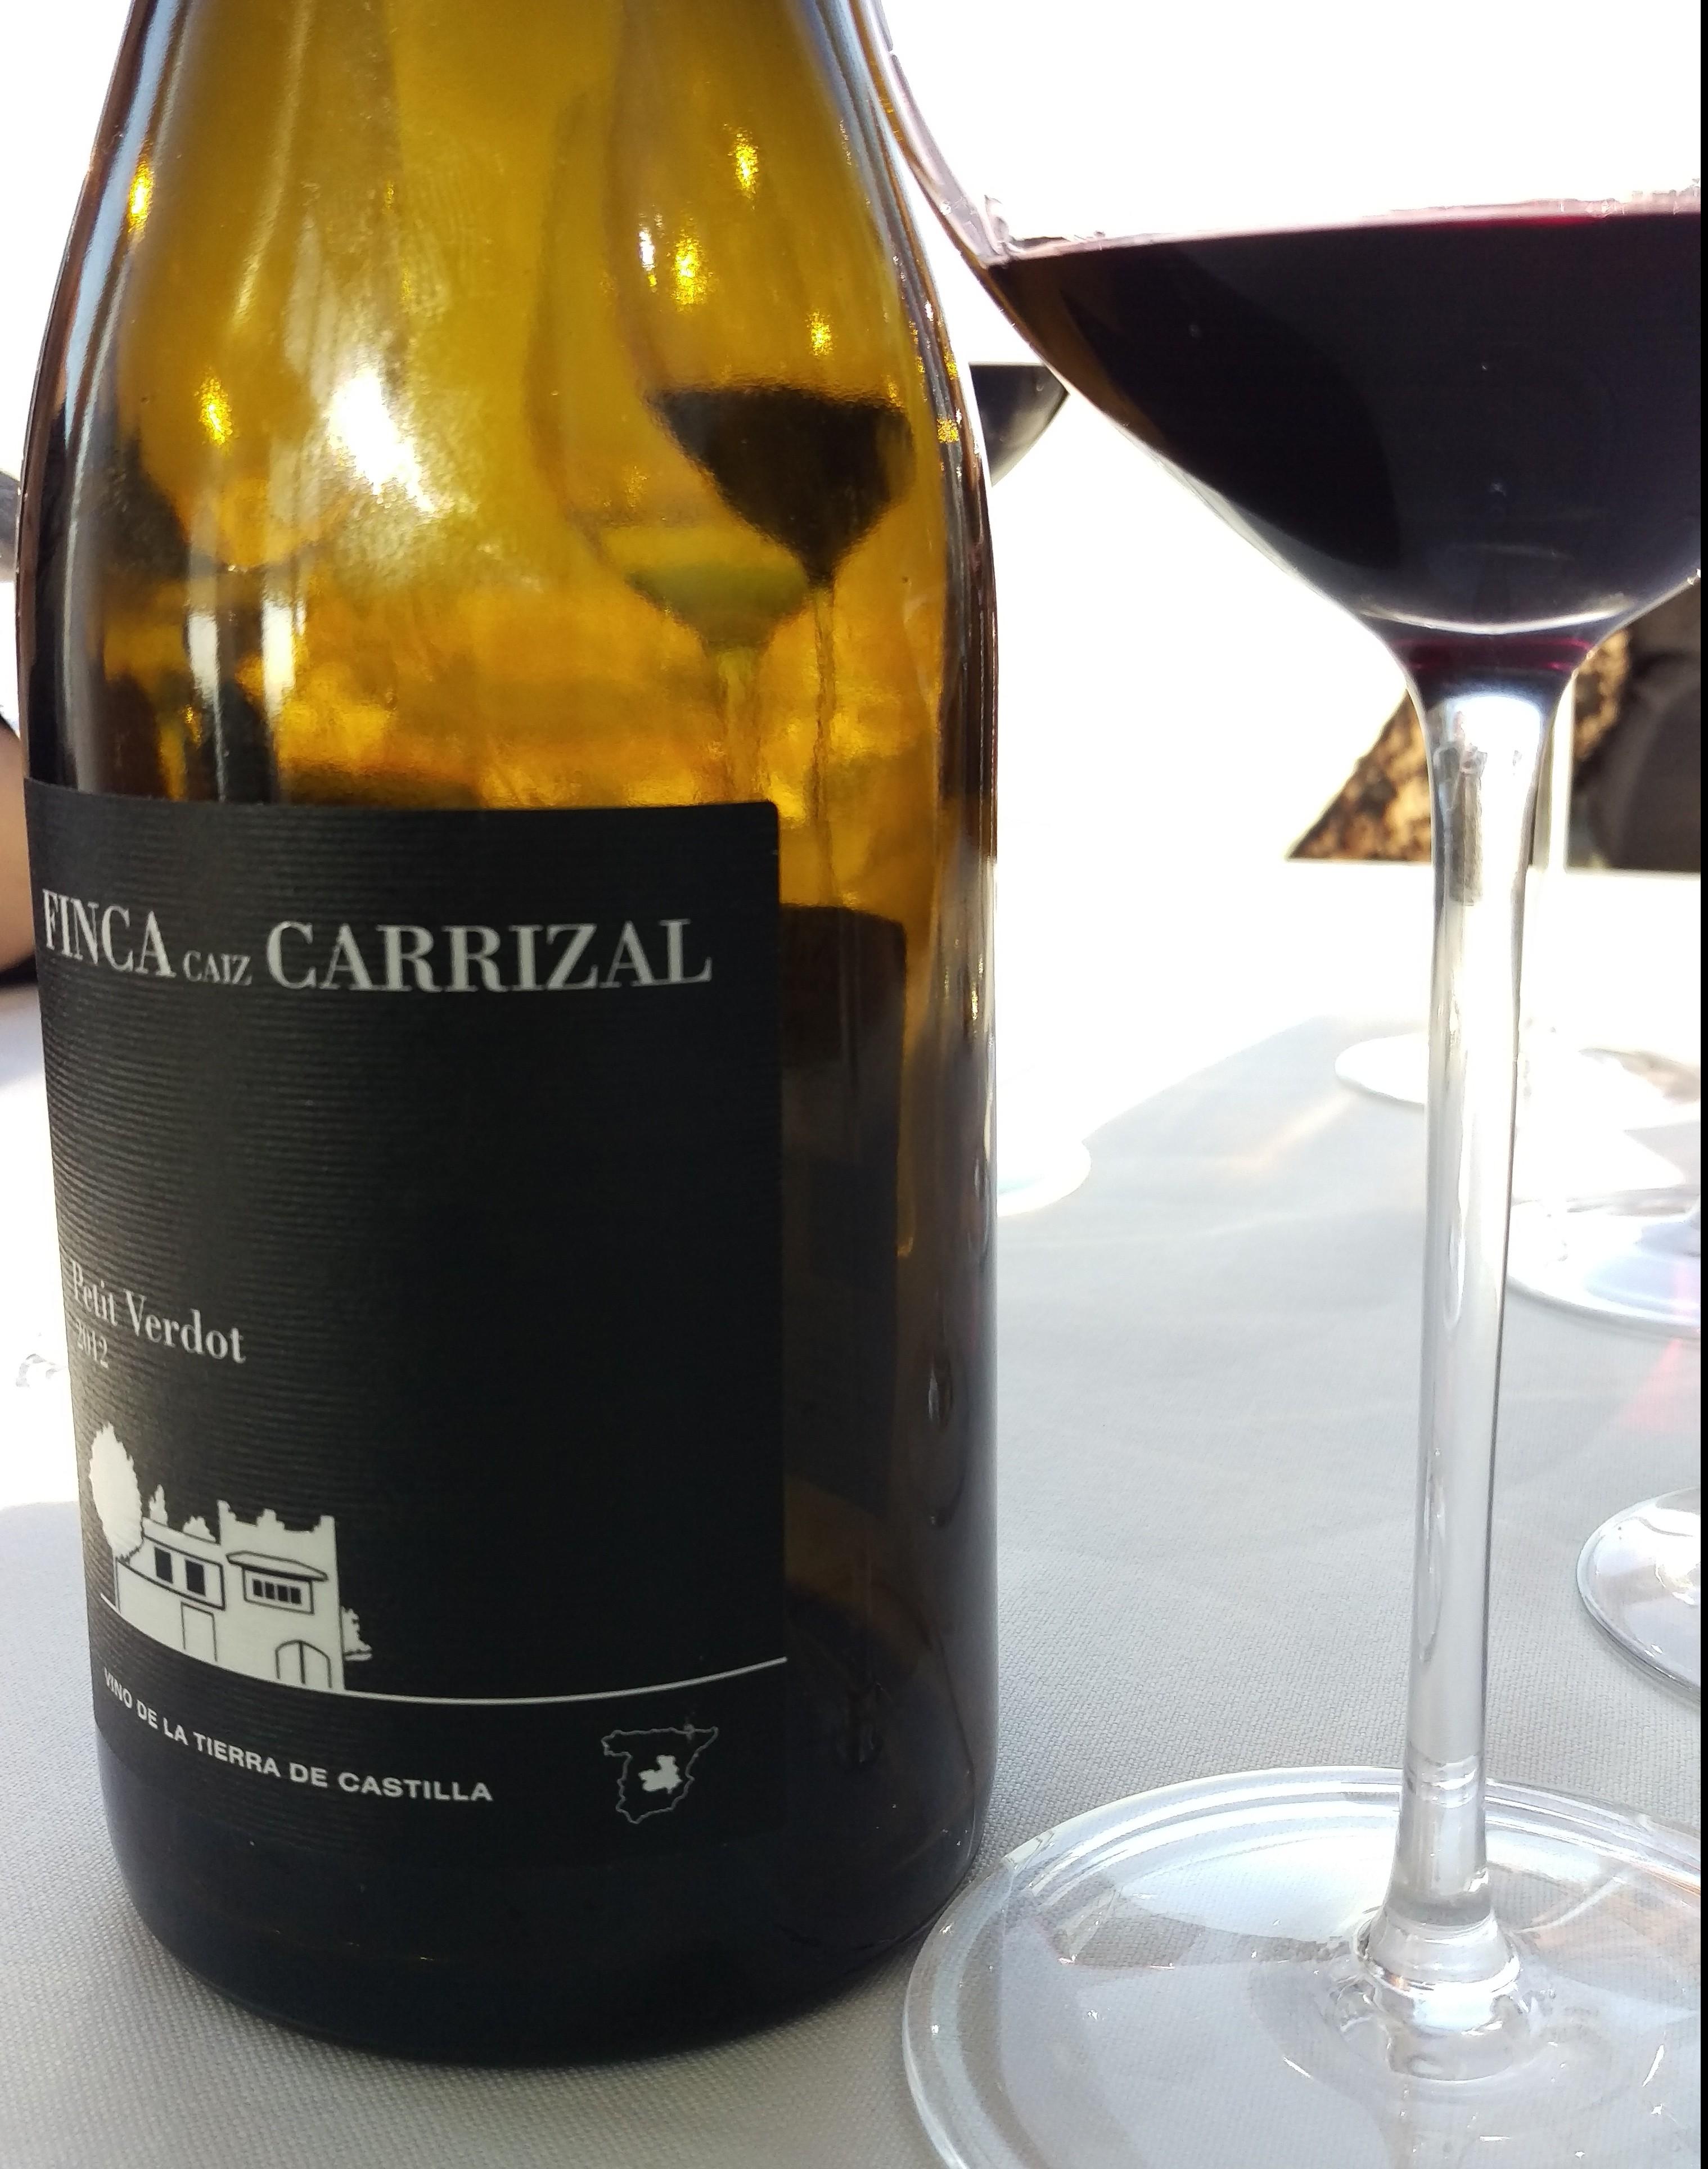 Finca Caiz Carrizal Petit Verdot 2012, frescura y complejidad de Castilla!